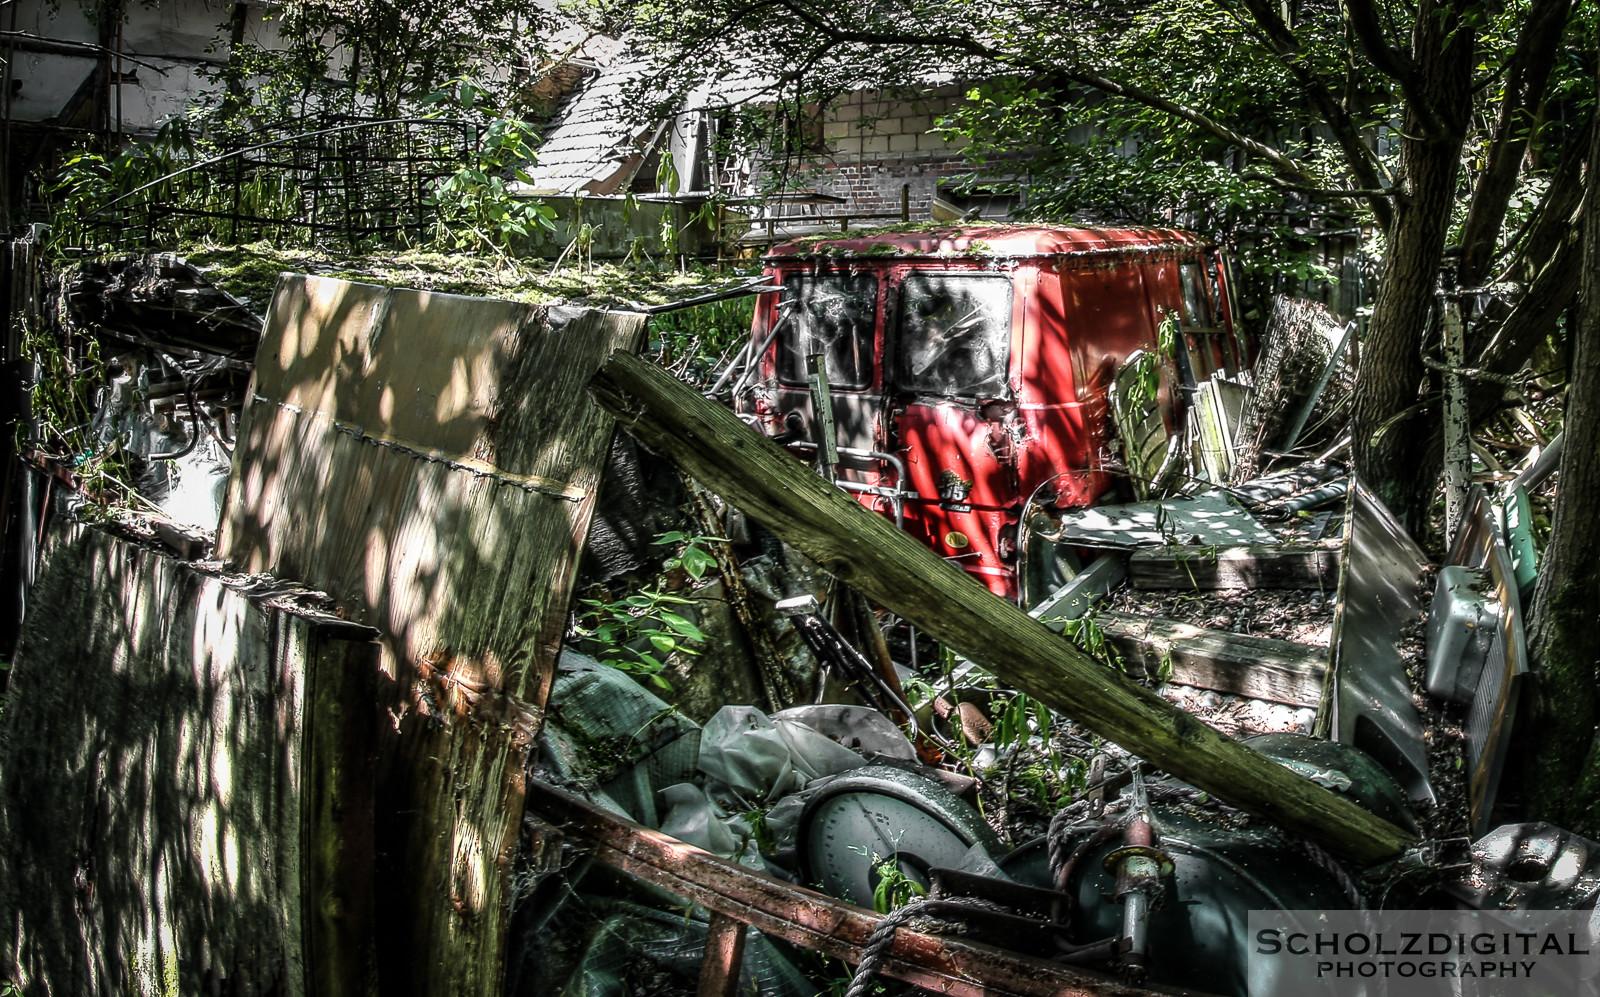 Abandoned, Bauernhof, Ferme Playboy, HDR, Lost Place, UE, Urban exploration, Urbex, verlassen, Verlassene Orte, Verlassene Orte in Belgien, verlaten